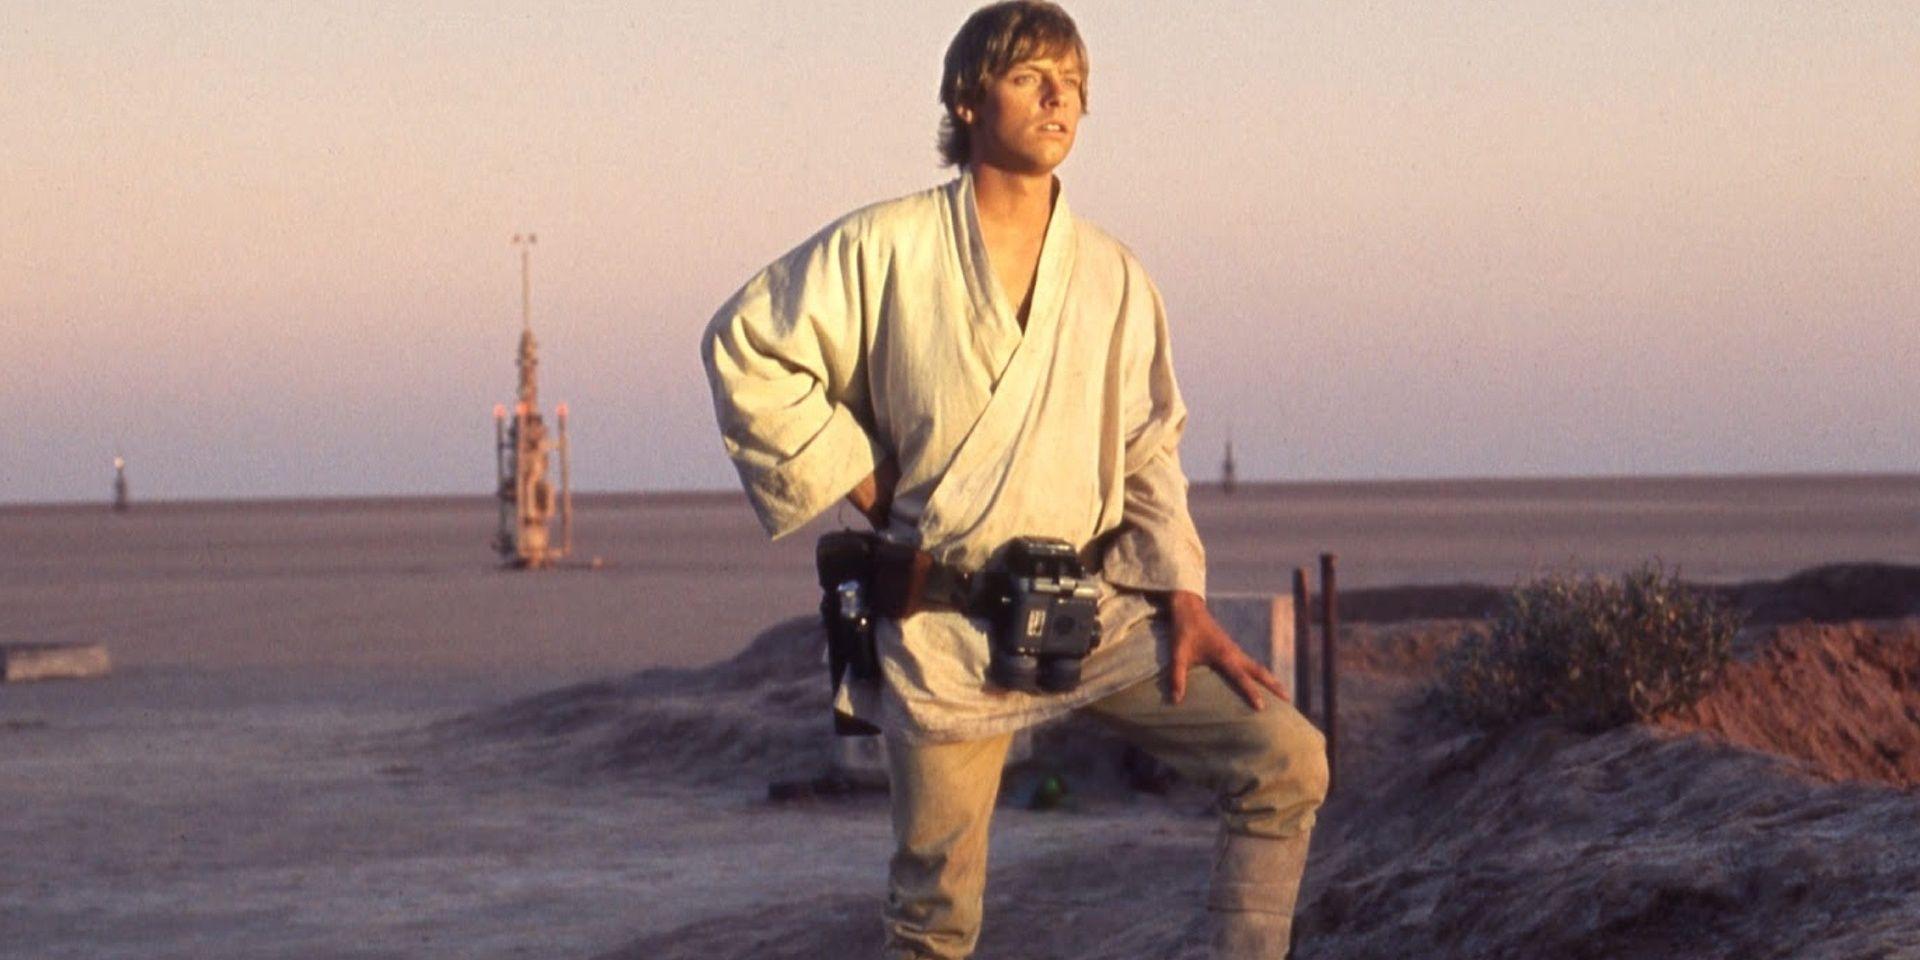 Is Star Wars a Superhero Story?